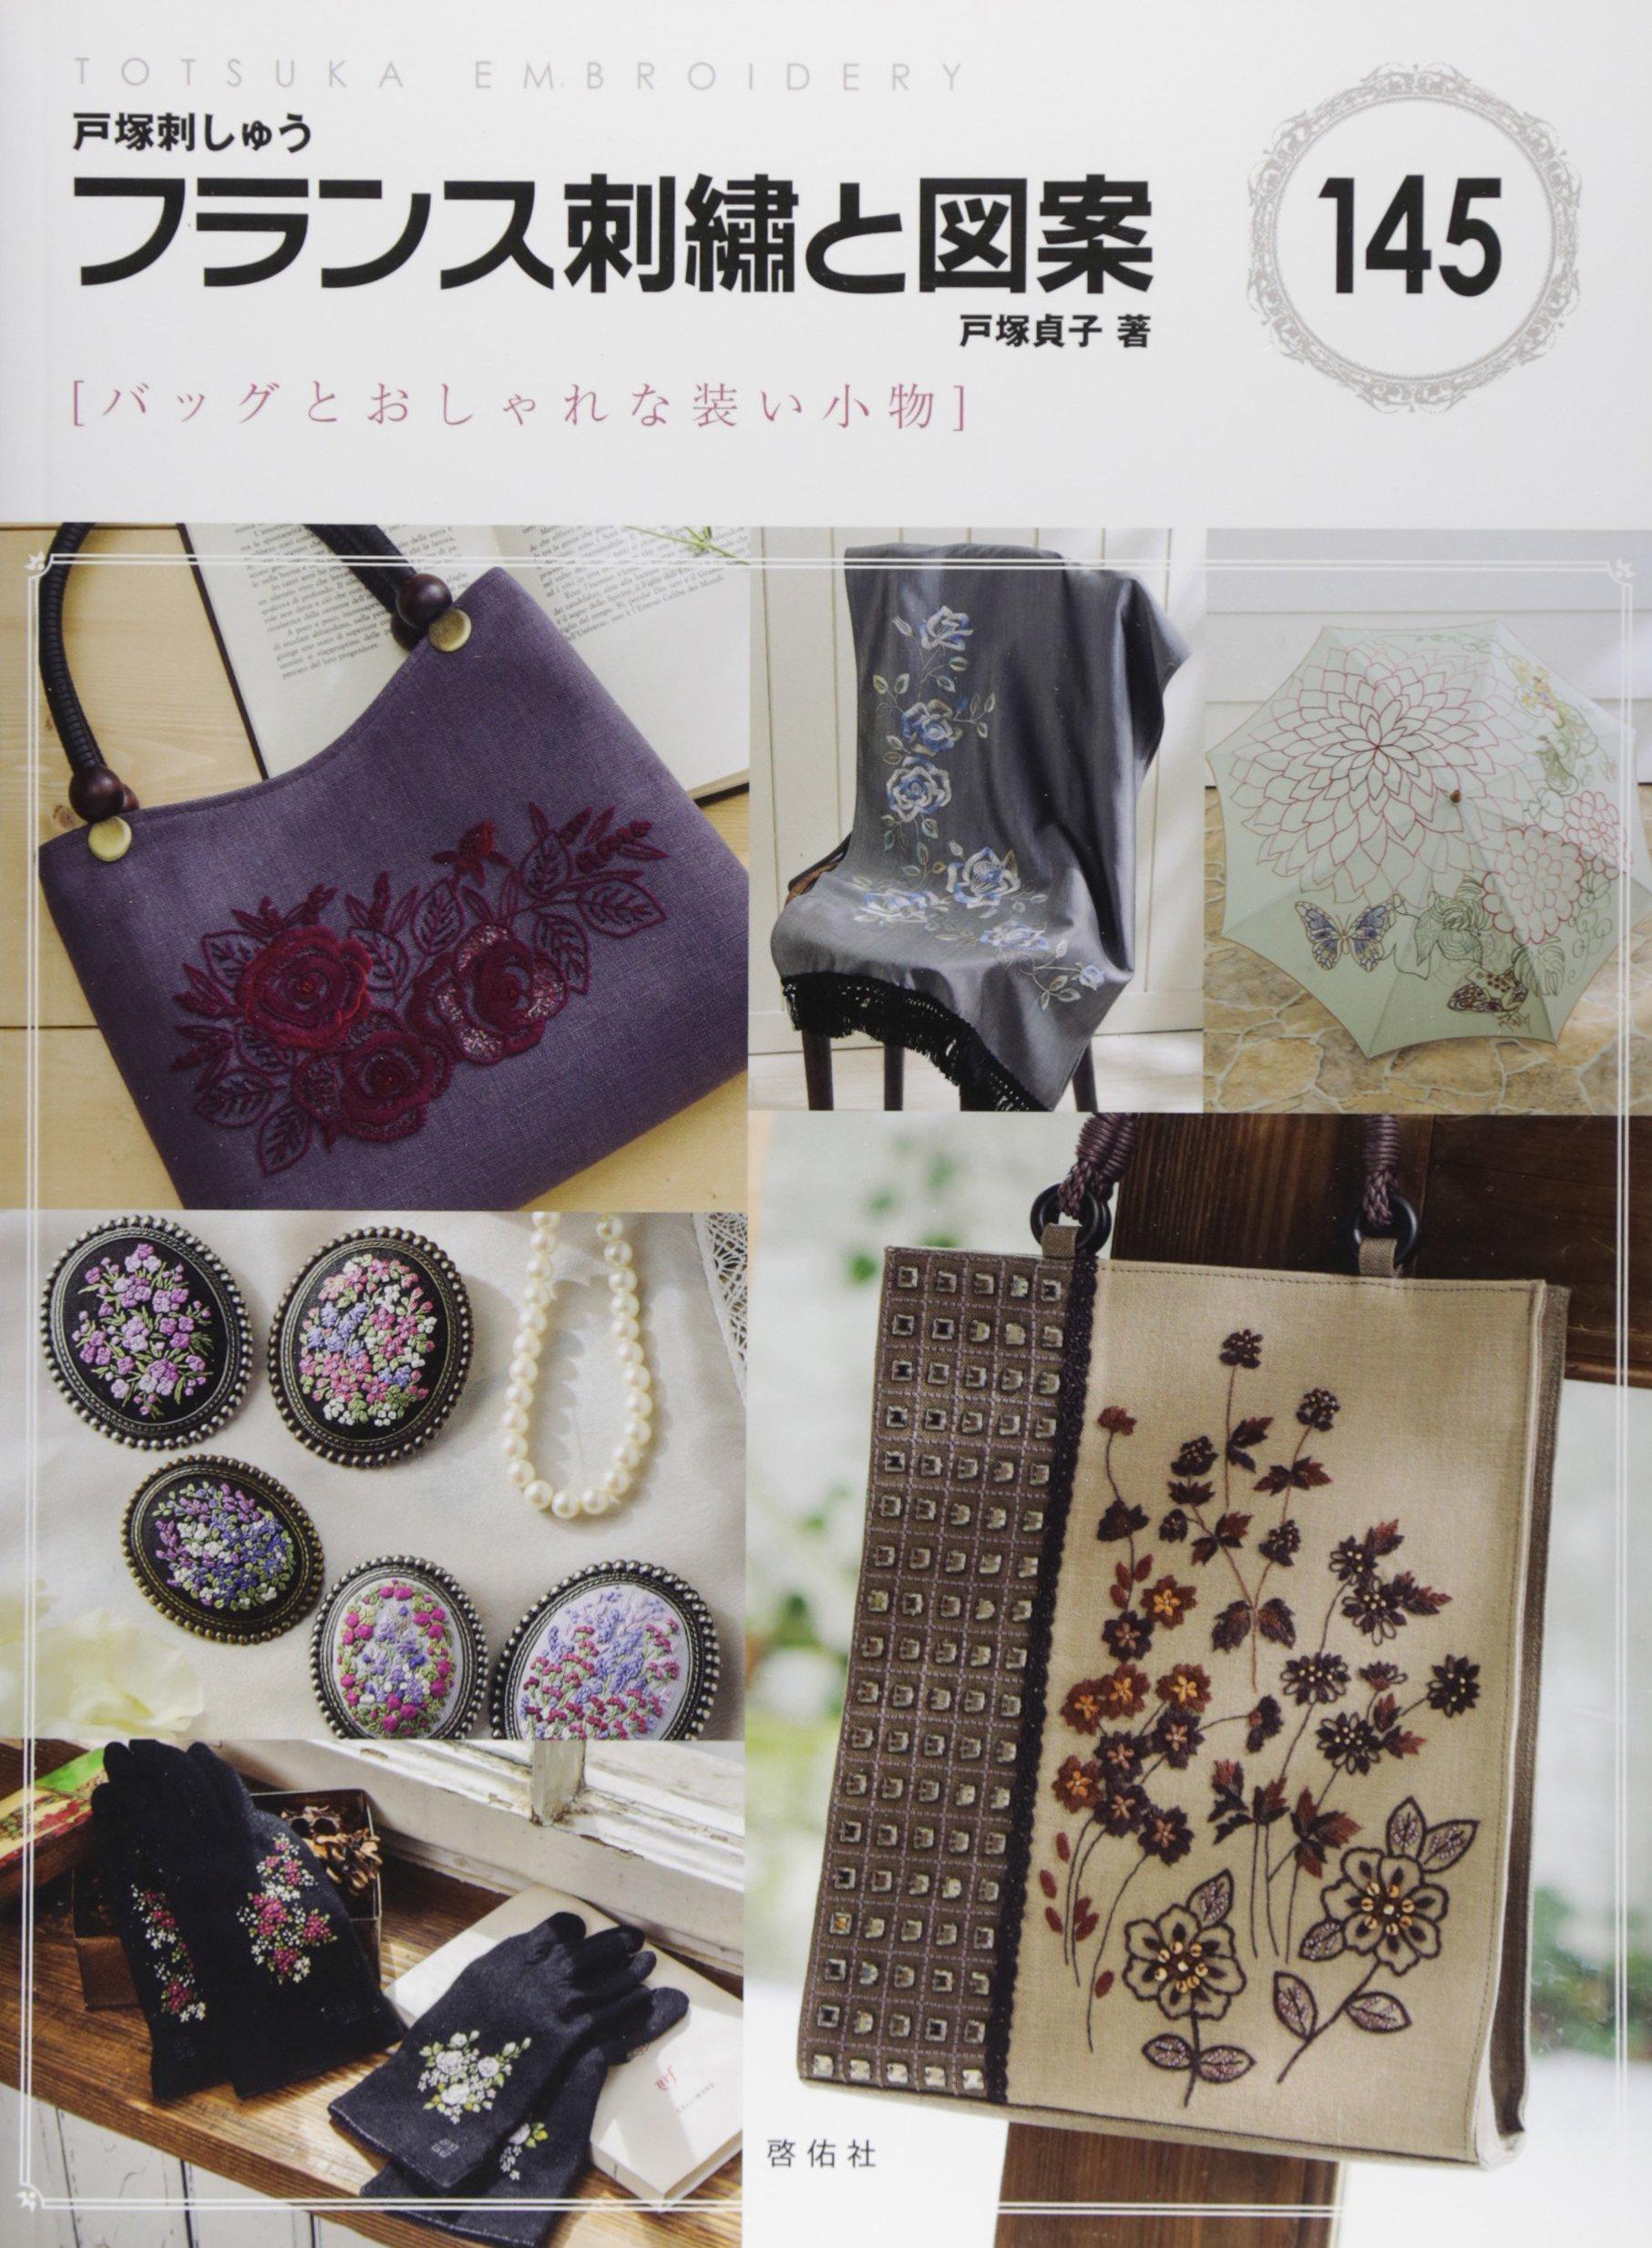 France embroidery and design 145 by Totsuka Sadako